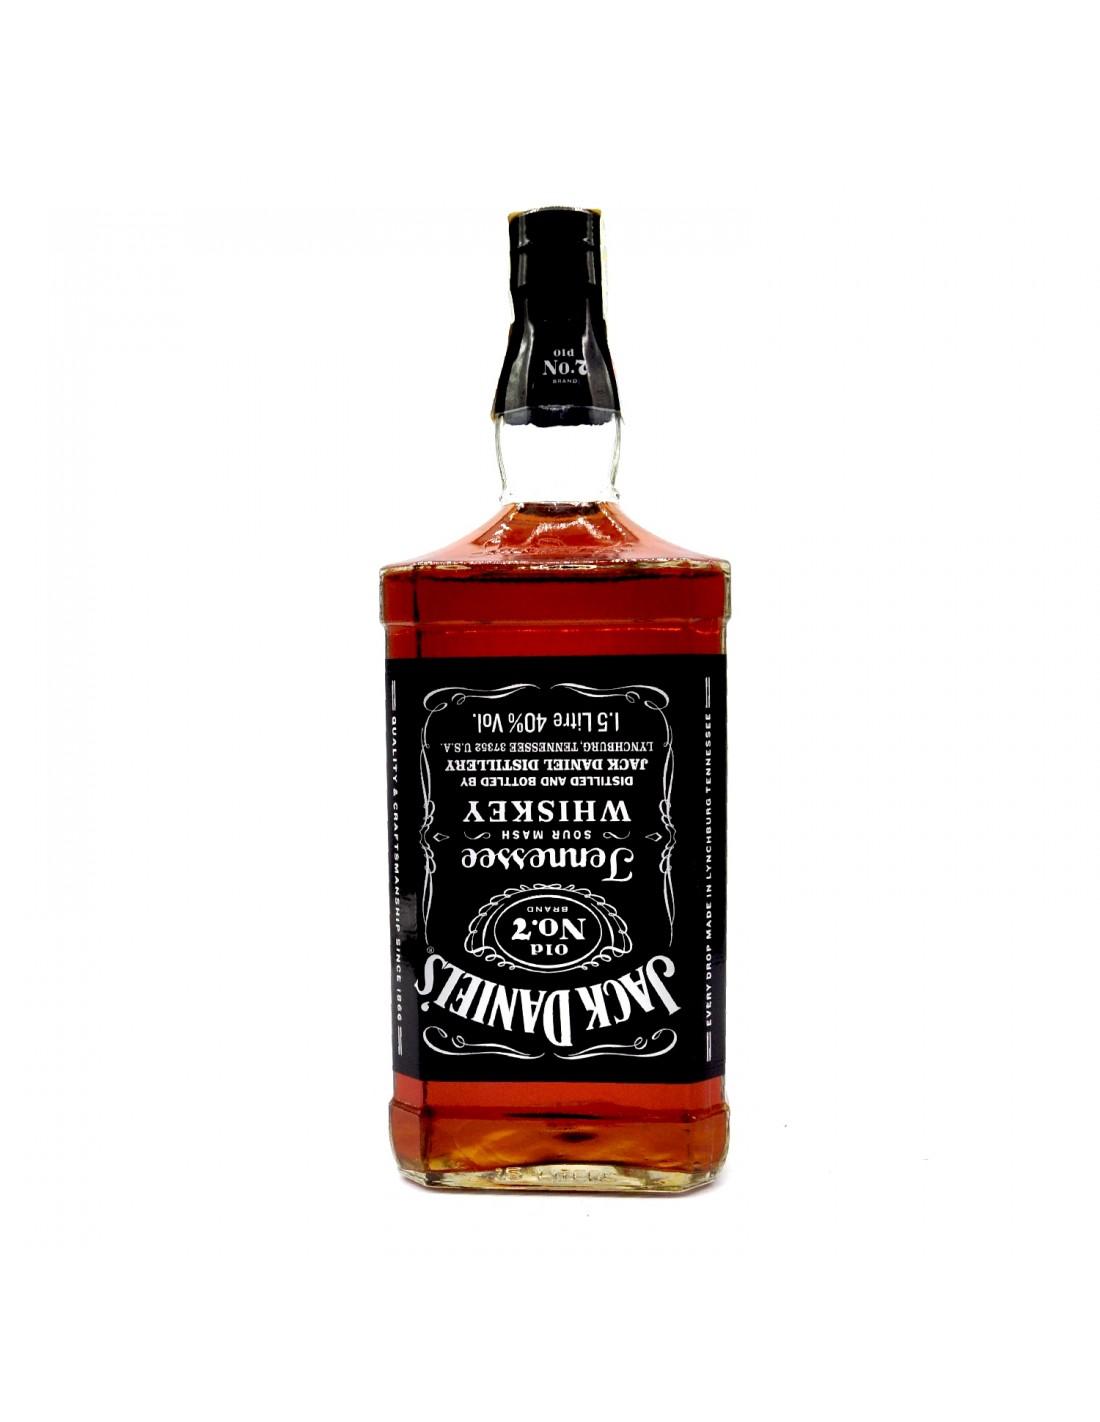 Whisky Bourbon Jack Daniel's, 40% alc., 1.5L, America